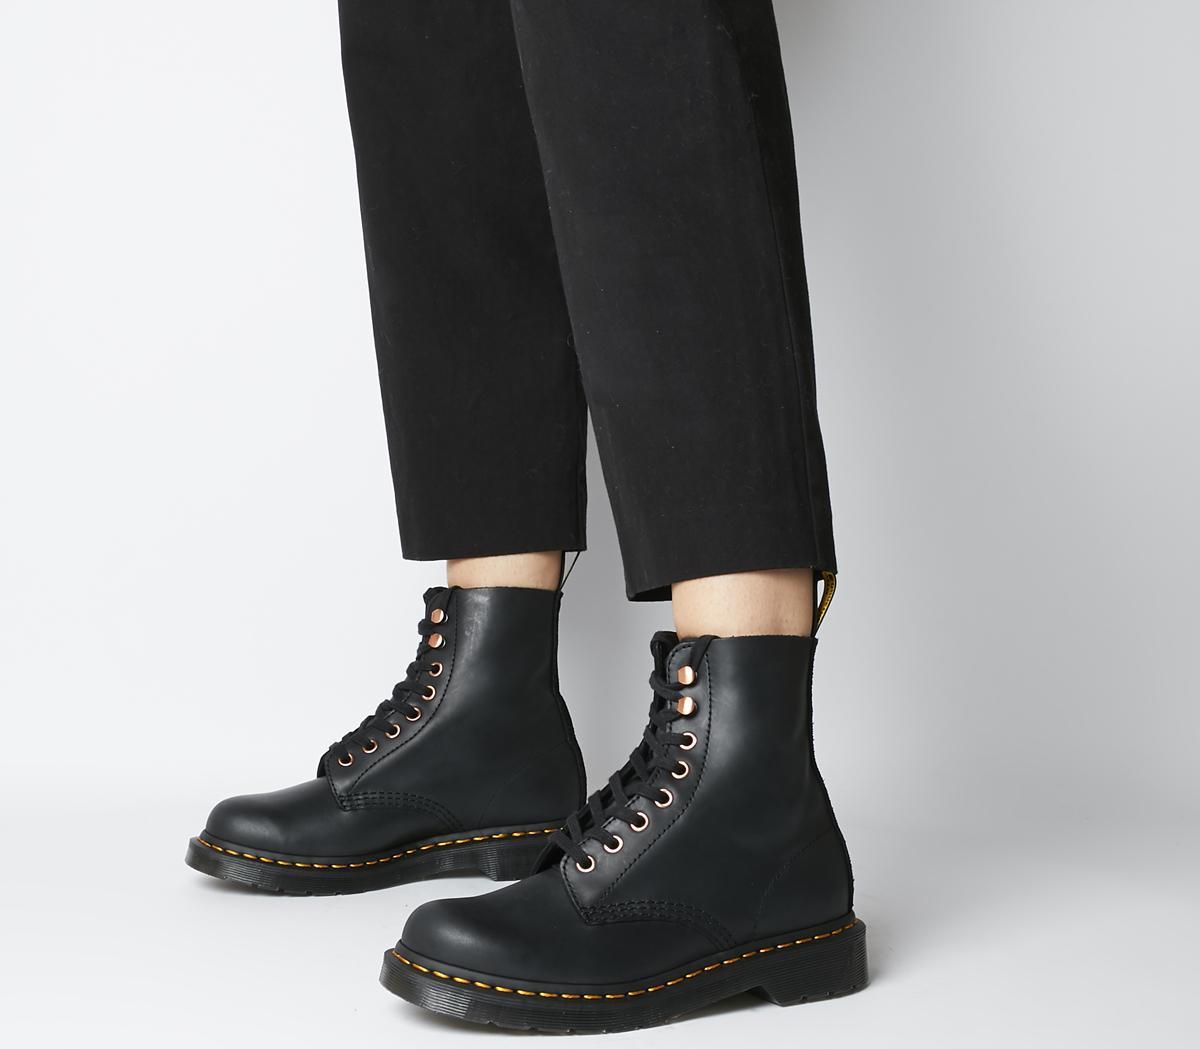 8 Eyelet Soap Stone Boots